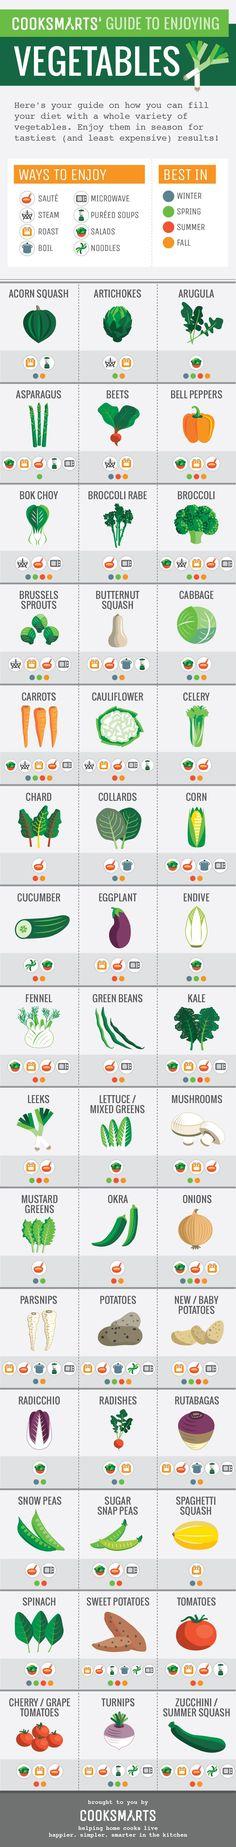 100+ Ways to Enjoy Your Vegetables via Cook Smarts